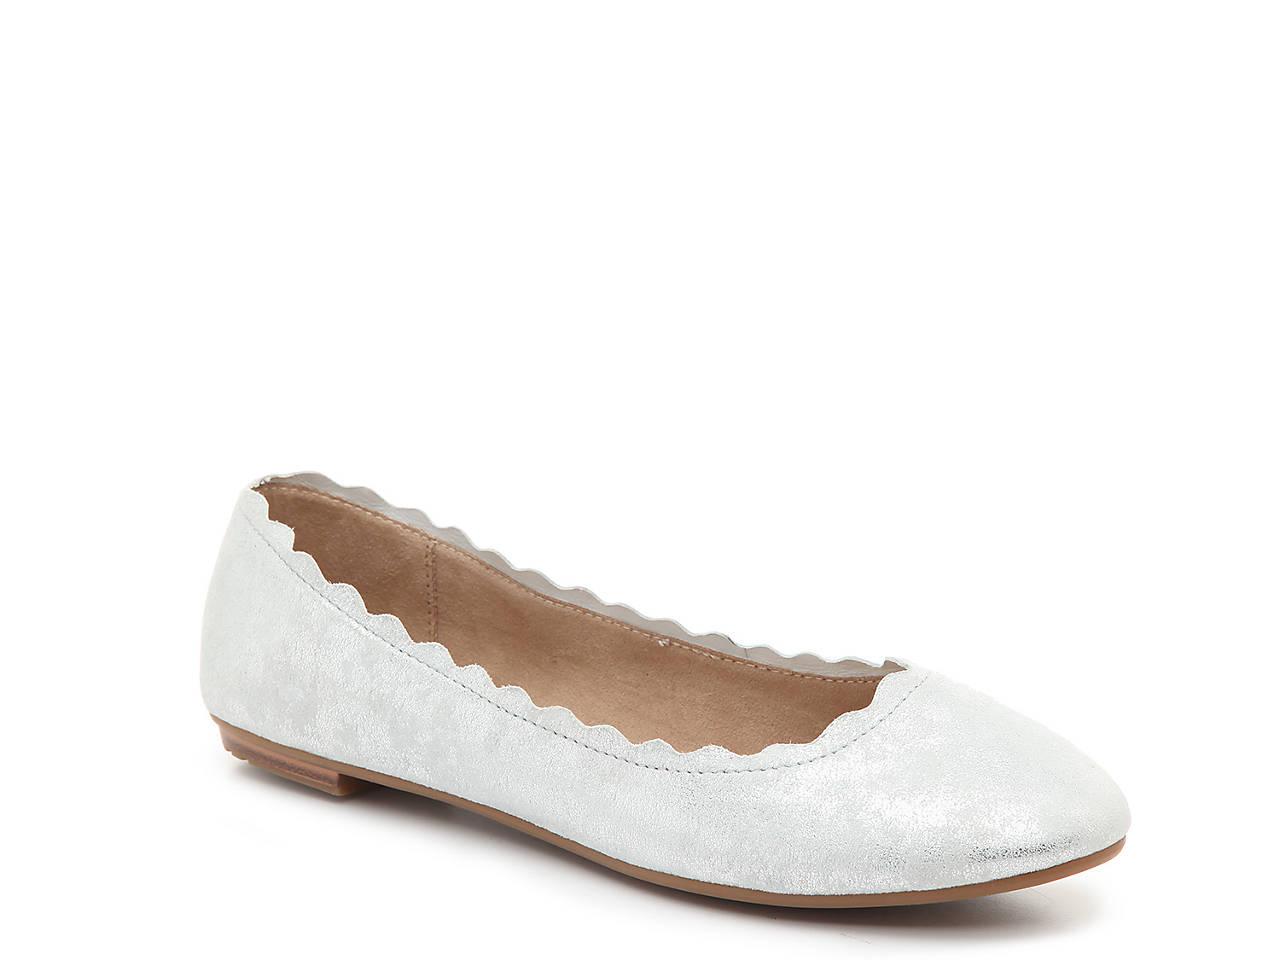 c58ca35f4ab Crown Vintage Weslyn Ballet Flat Women s Shoes